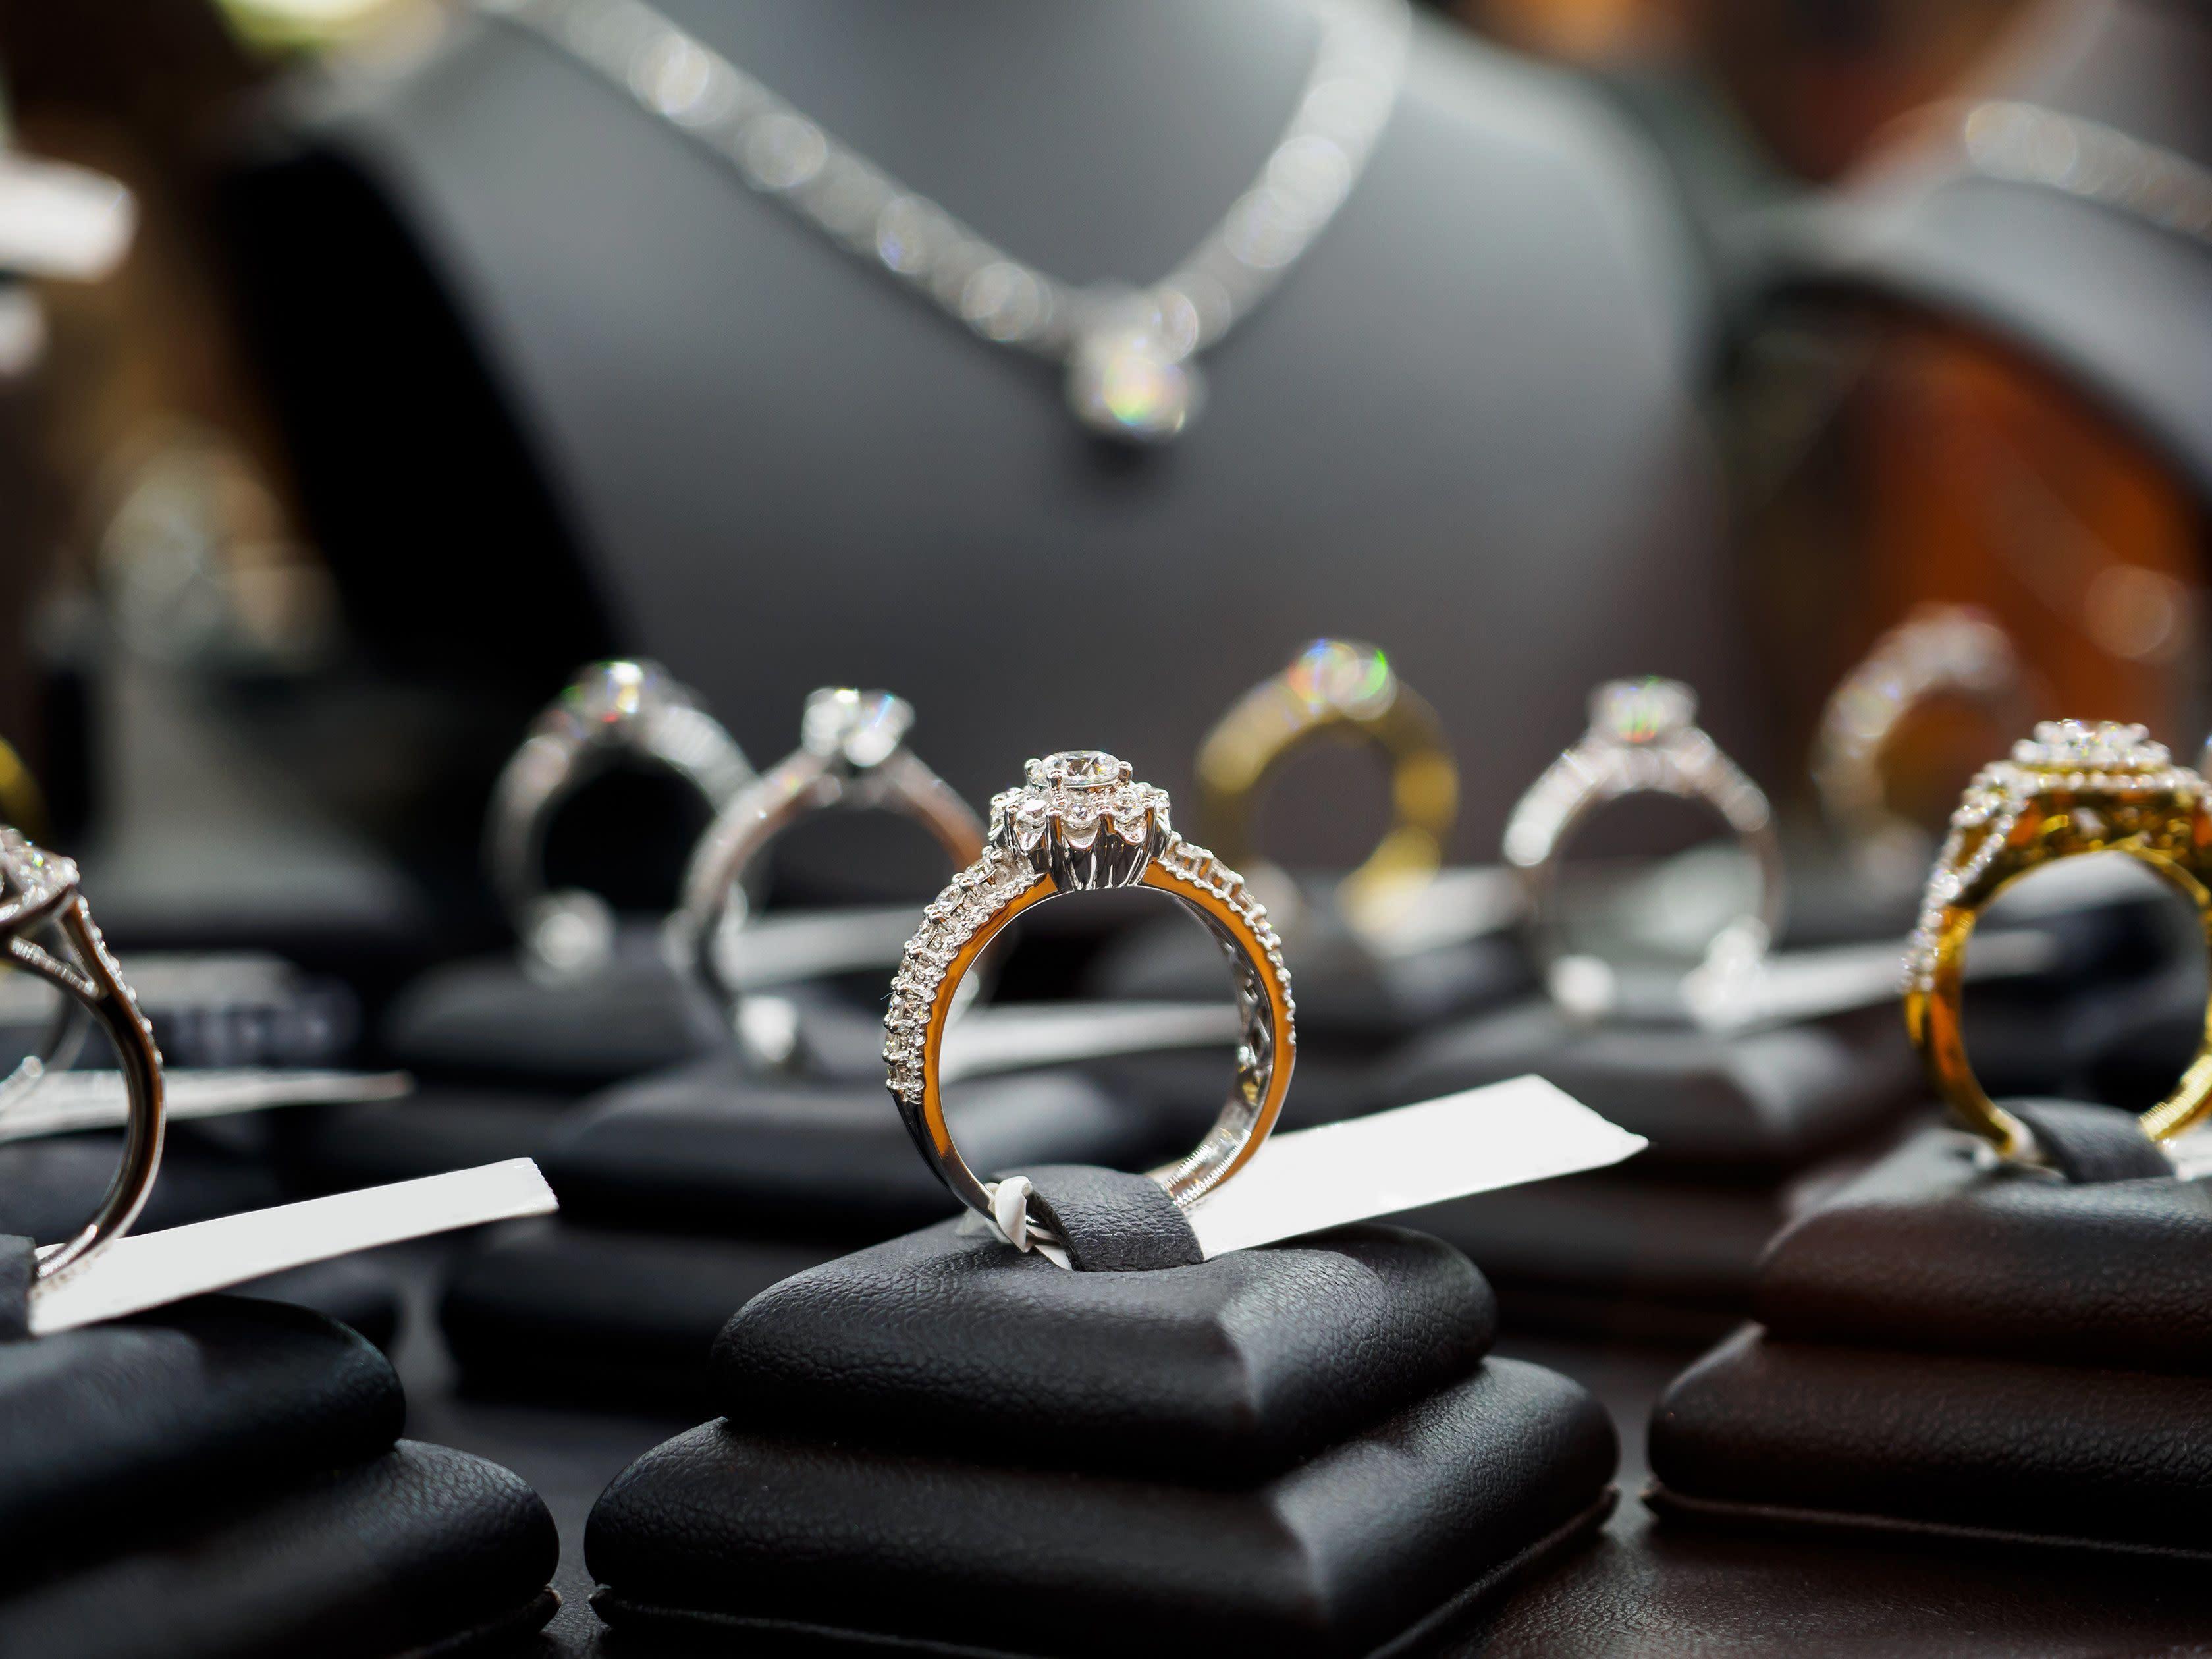 Lab-grown diamonds will survive Big Diamond's attempt to kill them, startup says